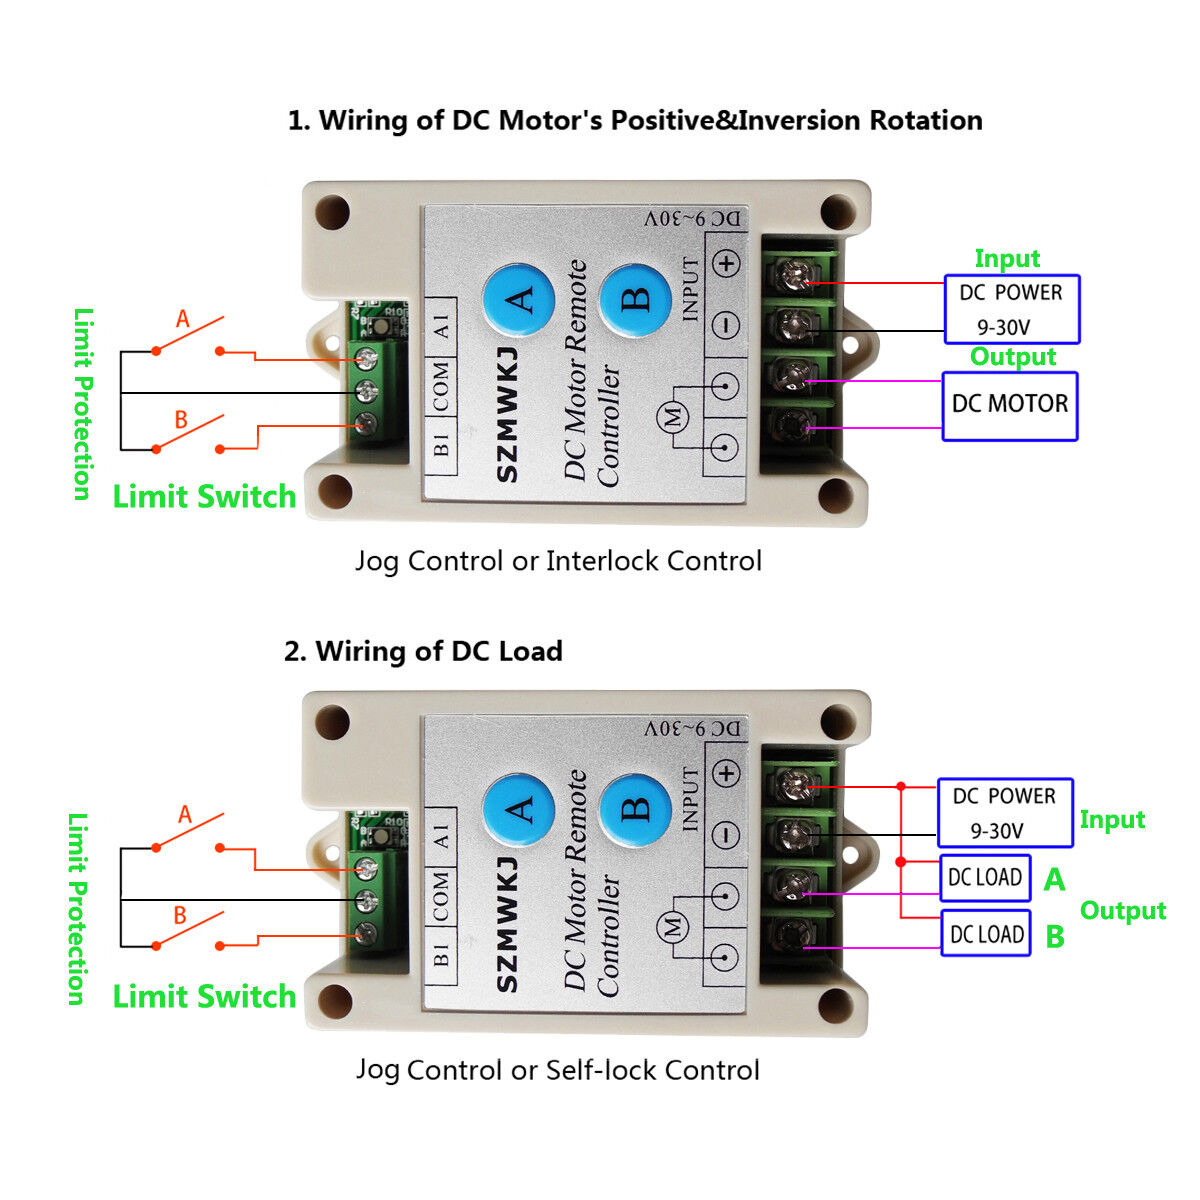 12V//24V Linear Actuator Controlller Wireless Positive Inversion Kit for DC Motor